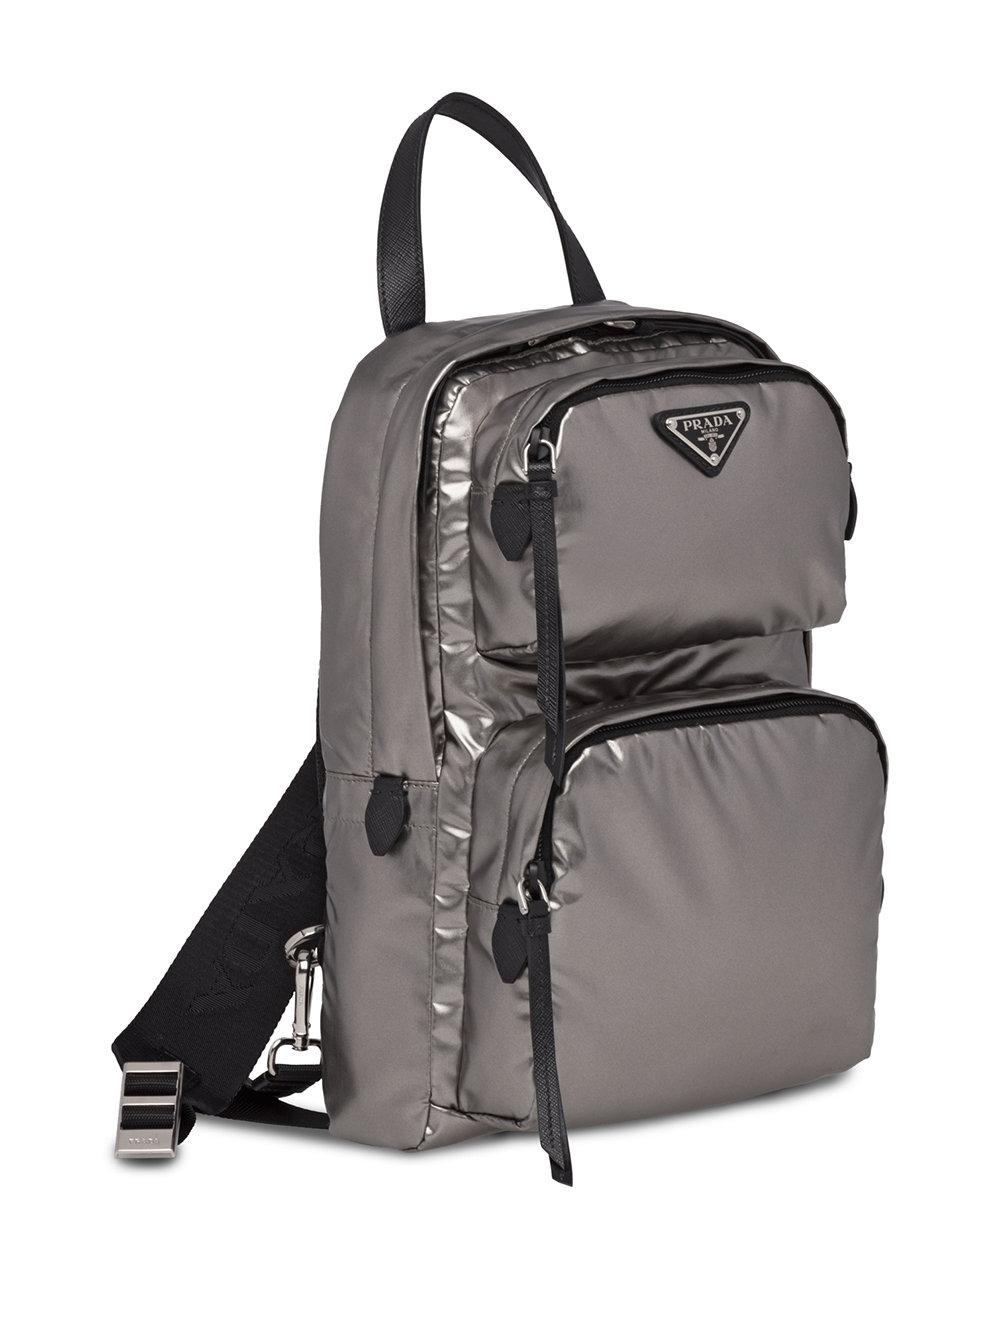 laminated logo backpack - Grey Prada bBL2JuEK4N